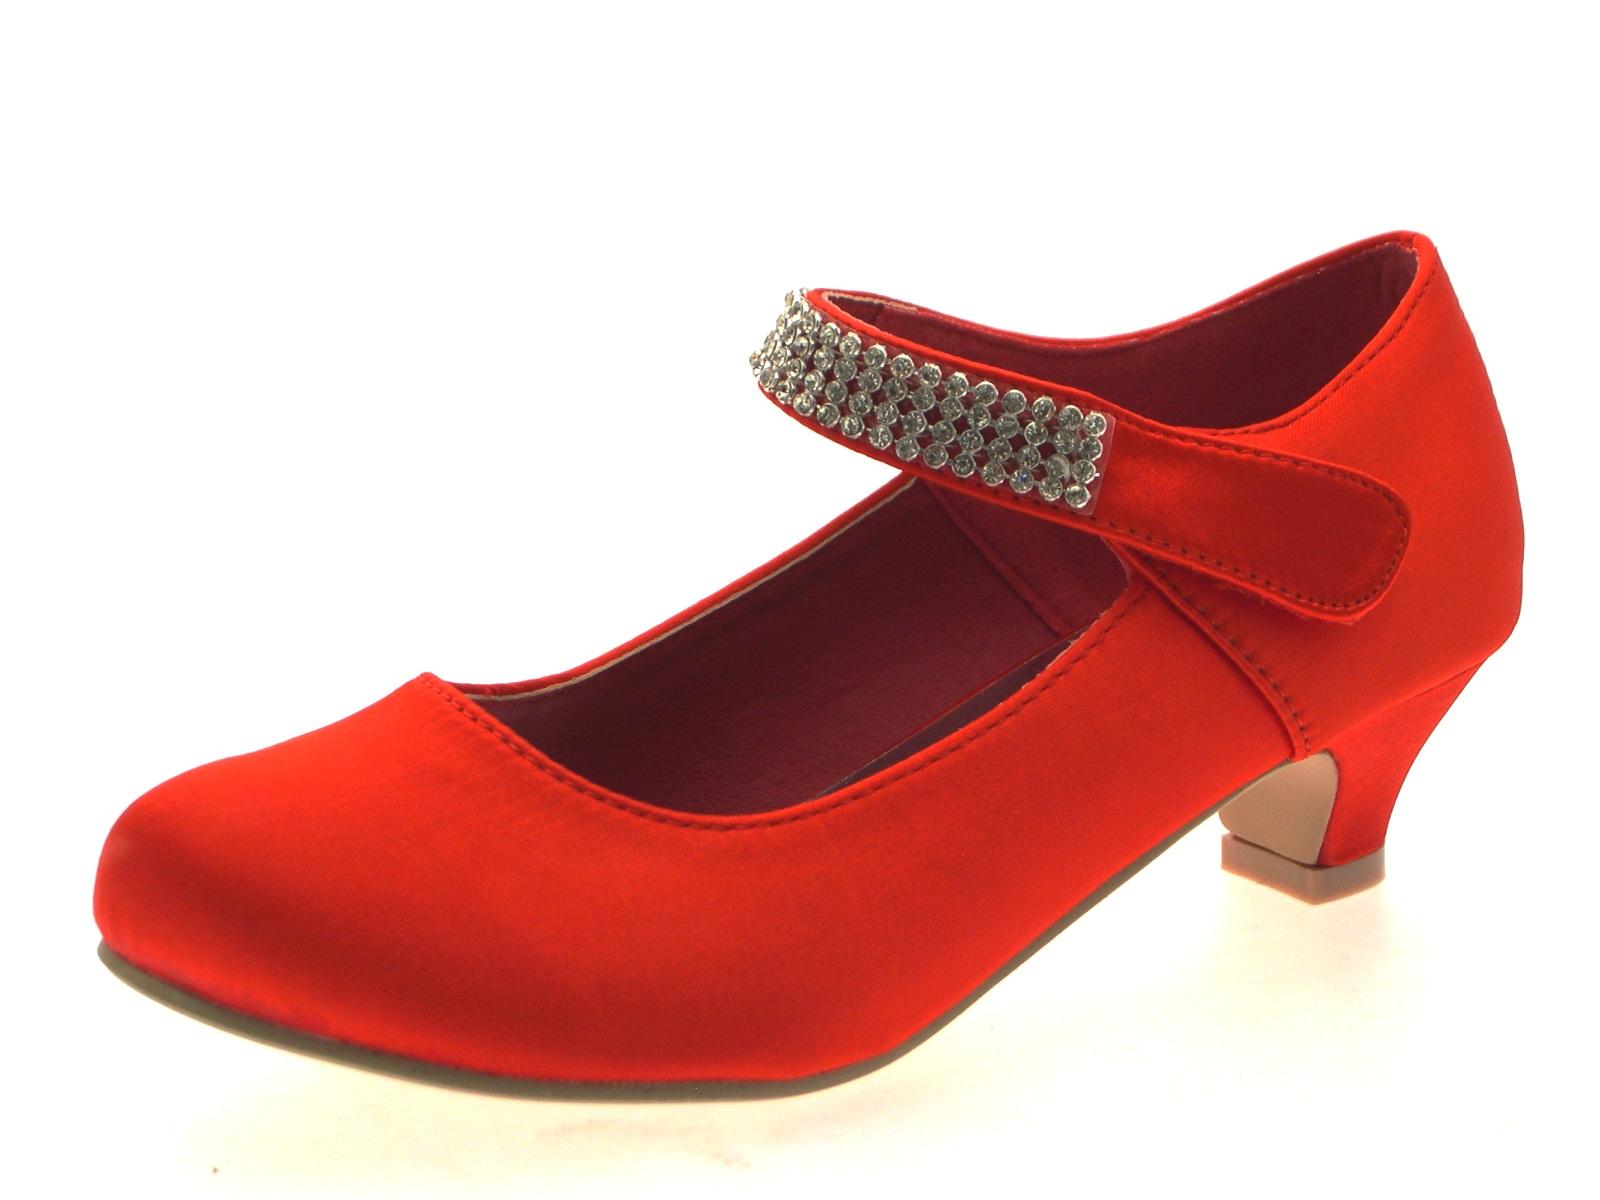 Kid High Heel Shoes Size